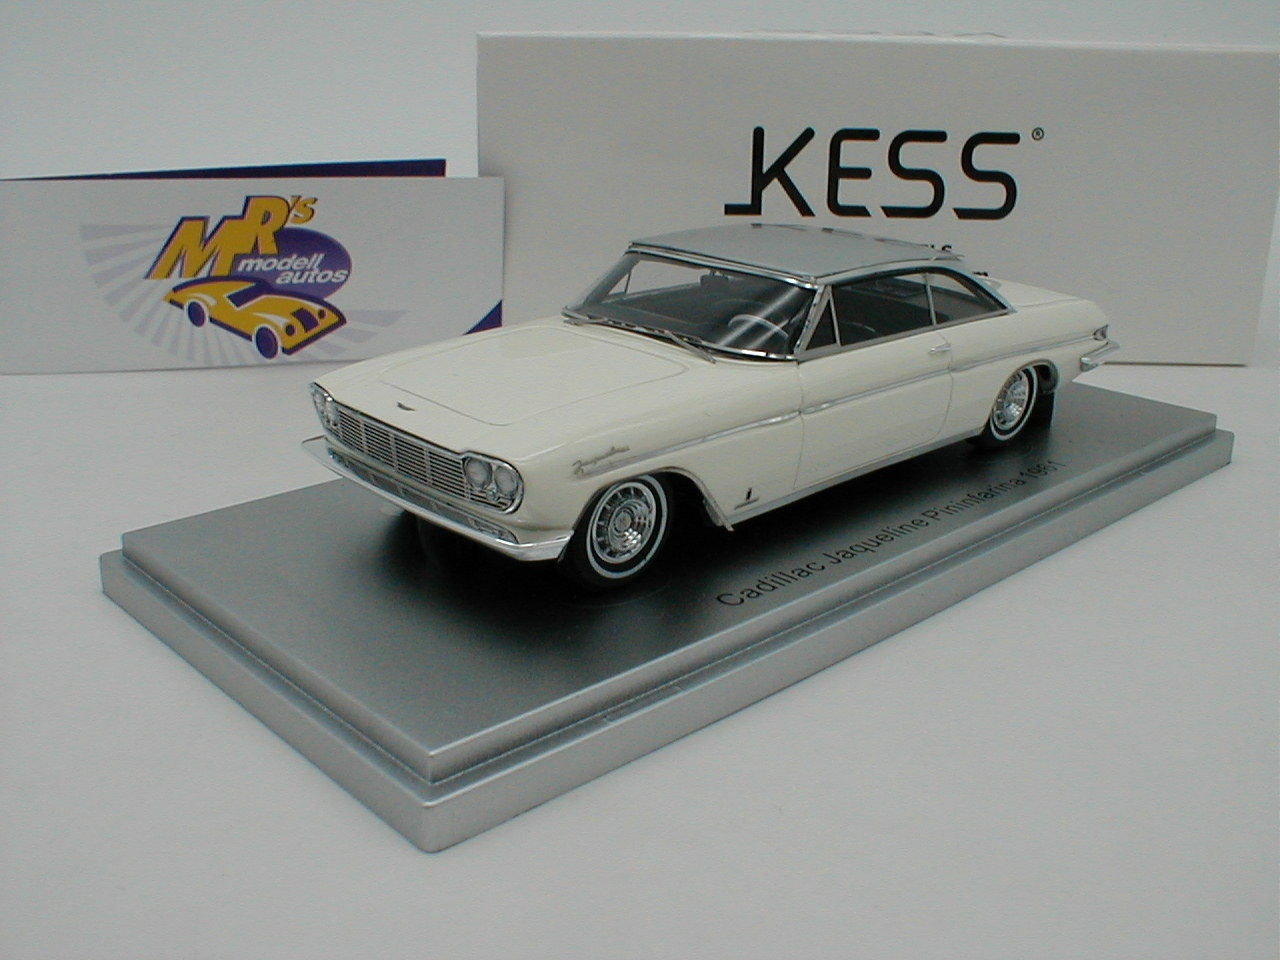 Kess 43020031 - cadillac jaquline pininfarina bj.1961  wei ß - silber  1 43 neu